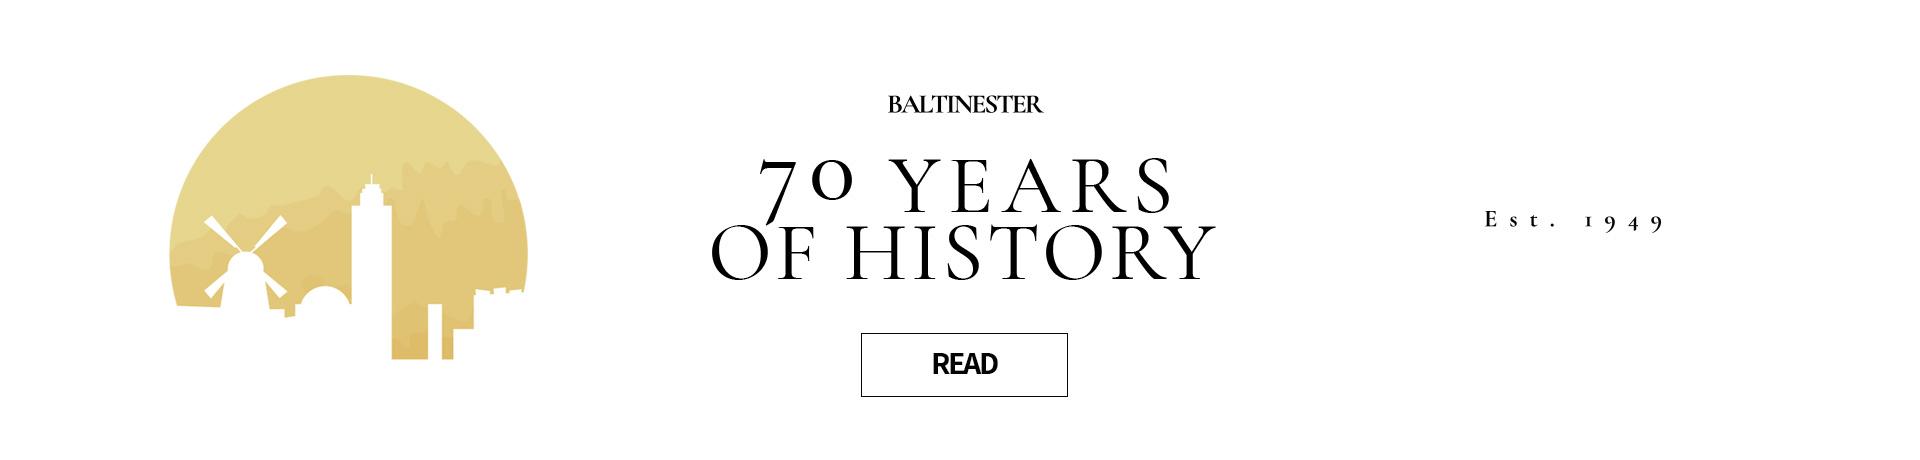 Baltinester Jewelry - 70 Years of History